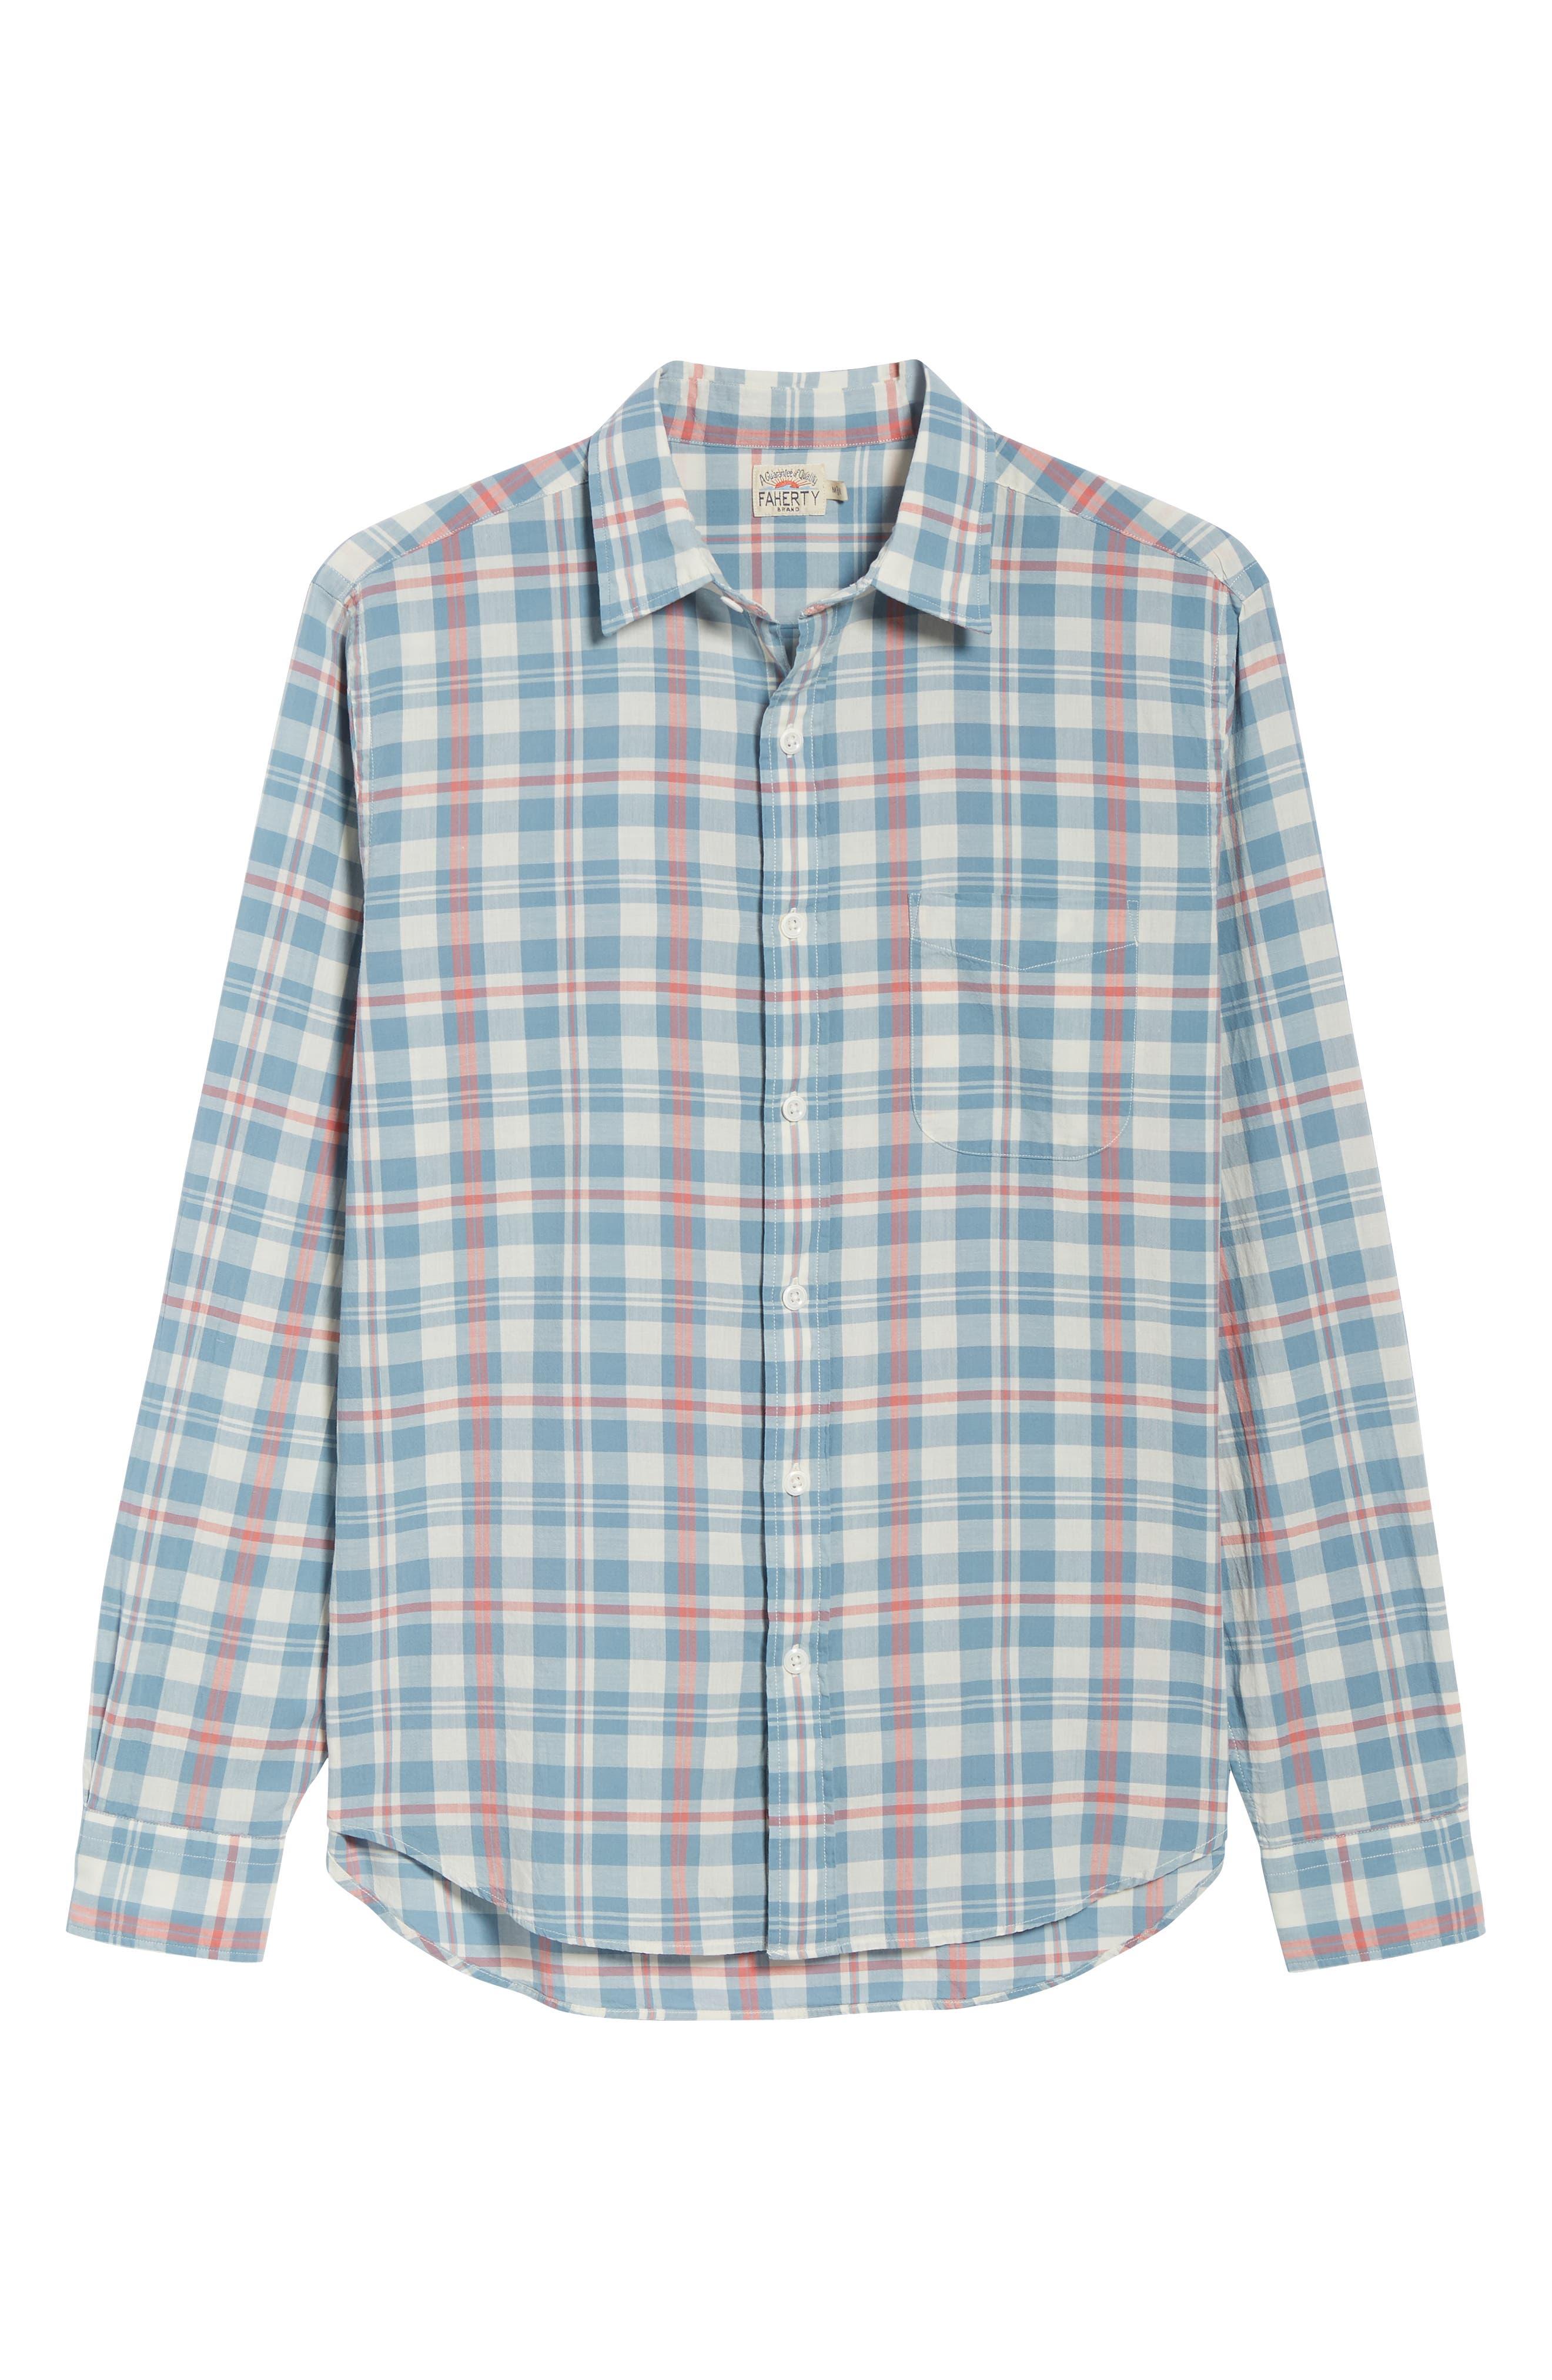 Ventura Plaid Sport Shirt,                             Alternate thumbnail 6, color,                             WASHED BLUE CREAM